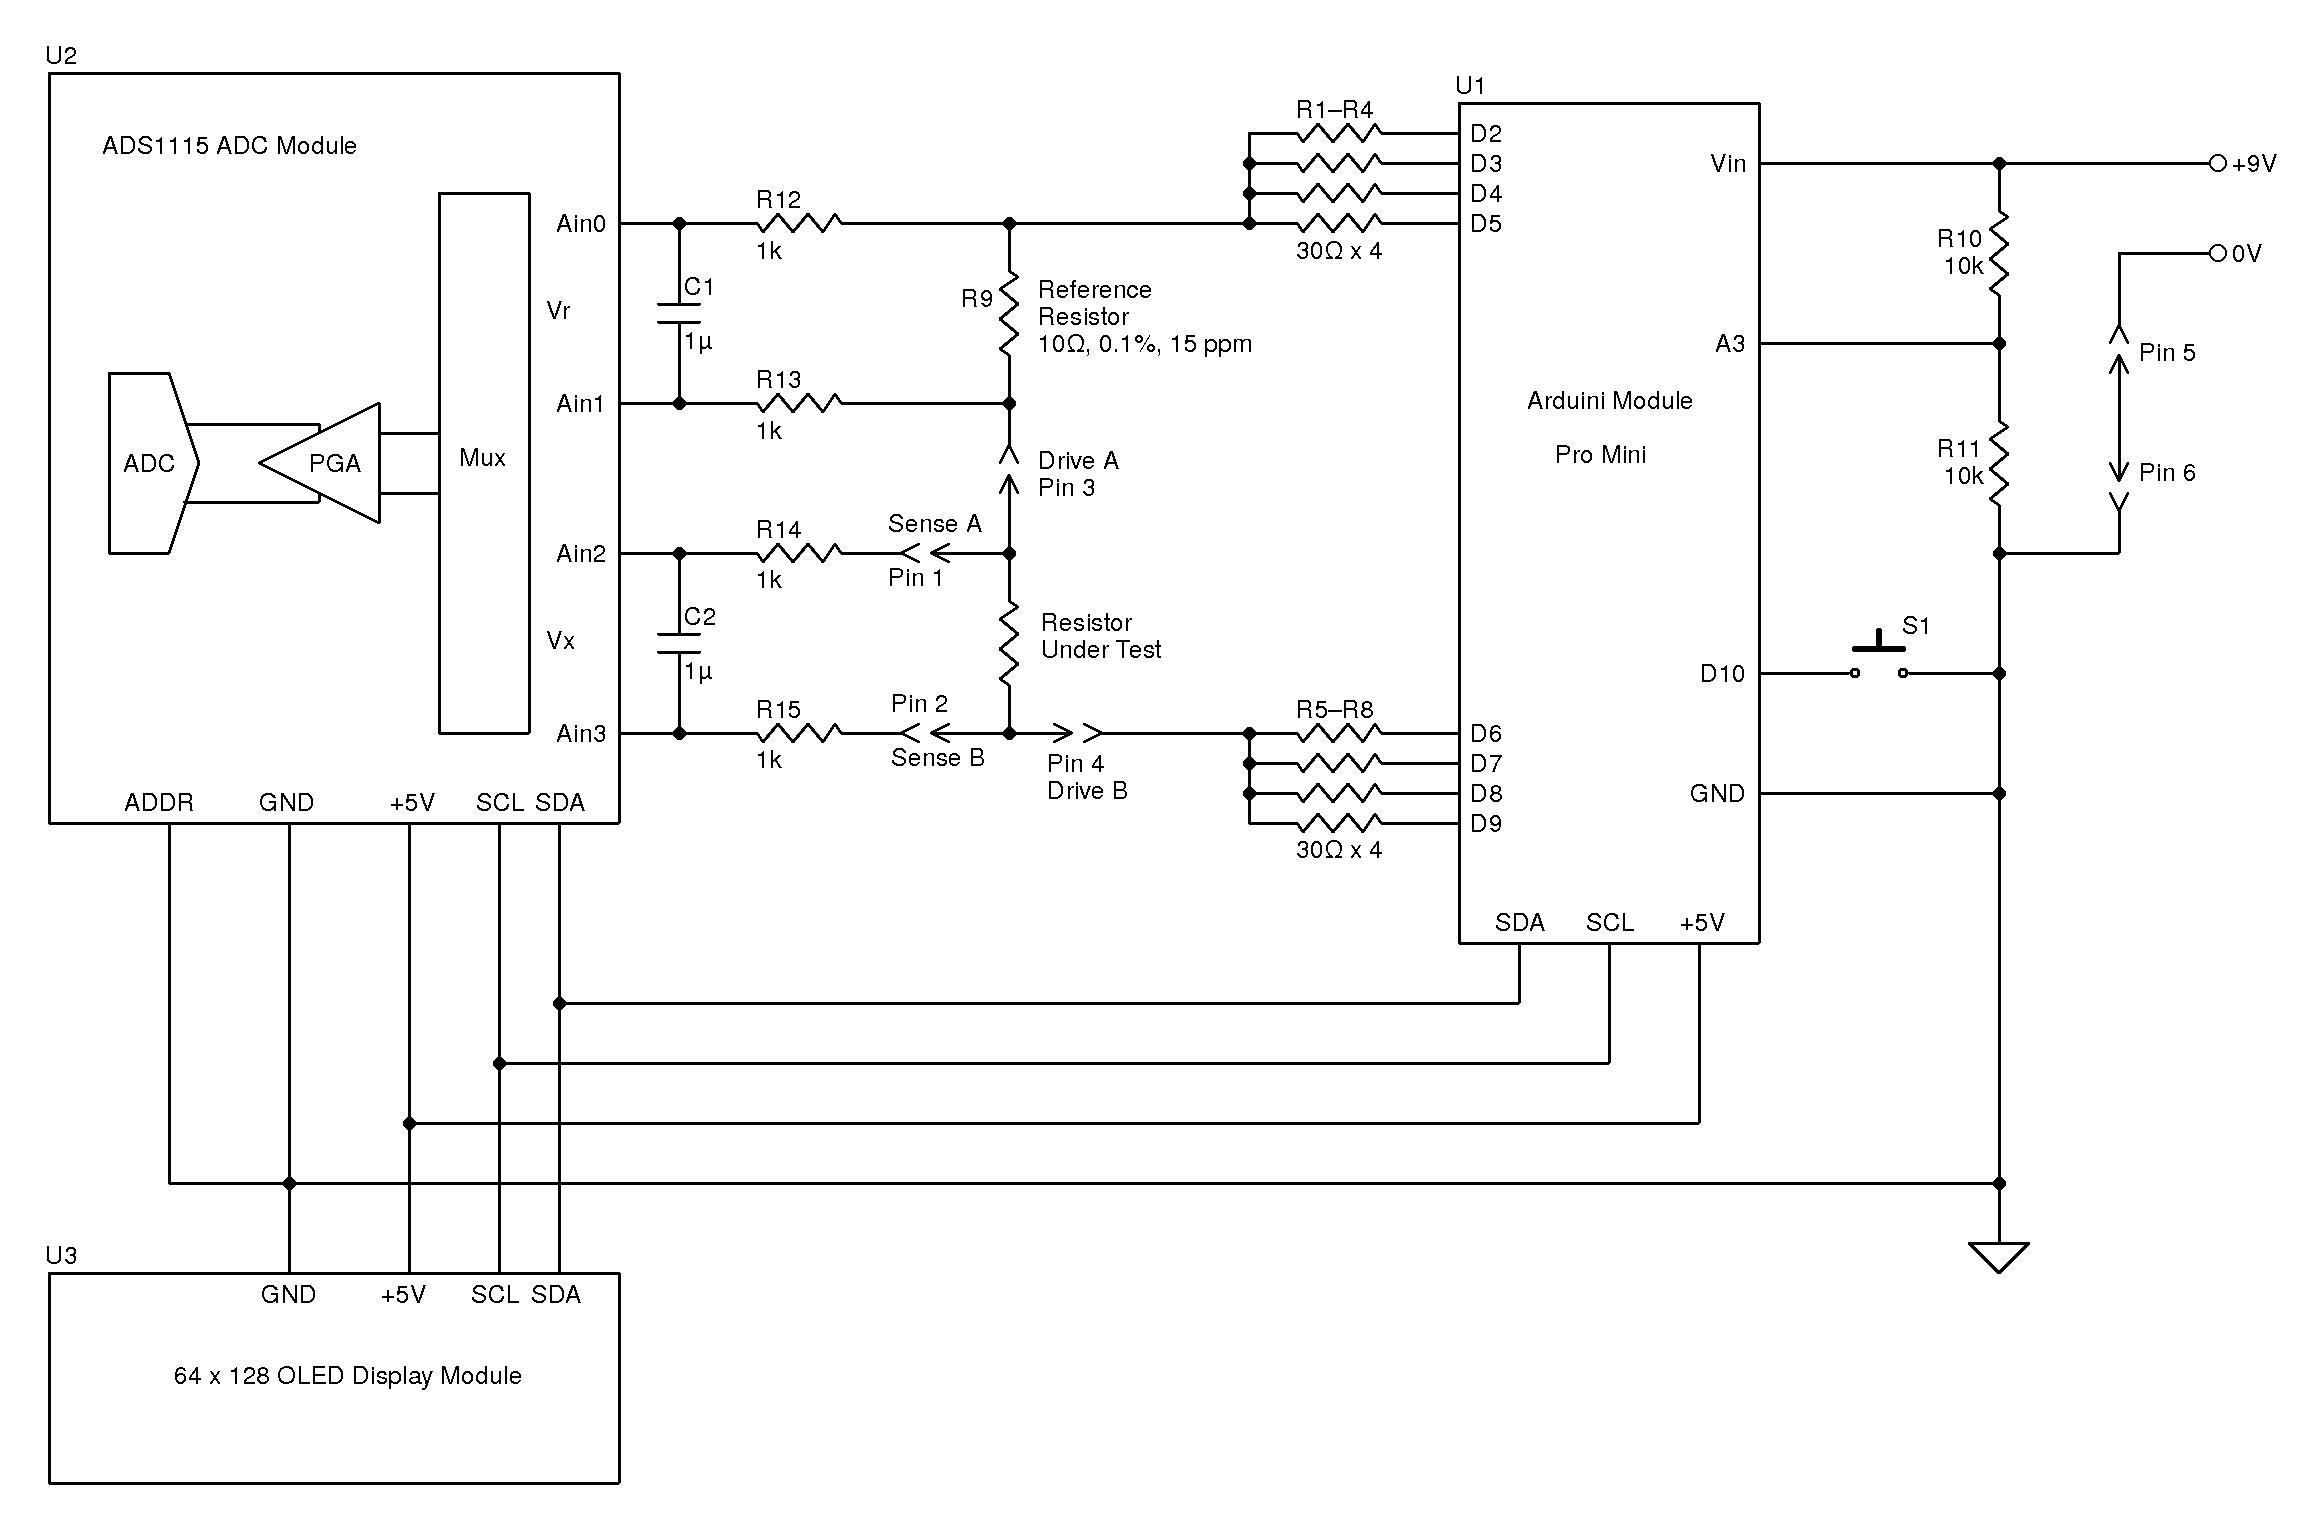 Build An Accurate Milliohm Meter Circuit Cellar Precision Receiver Battery Low Voltage Alarm Diagram Sad Dsg